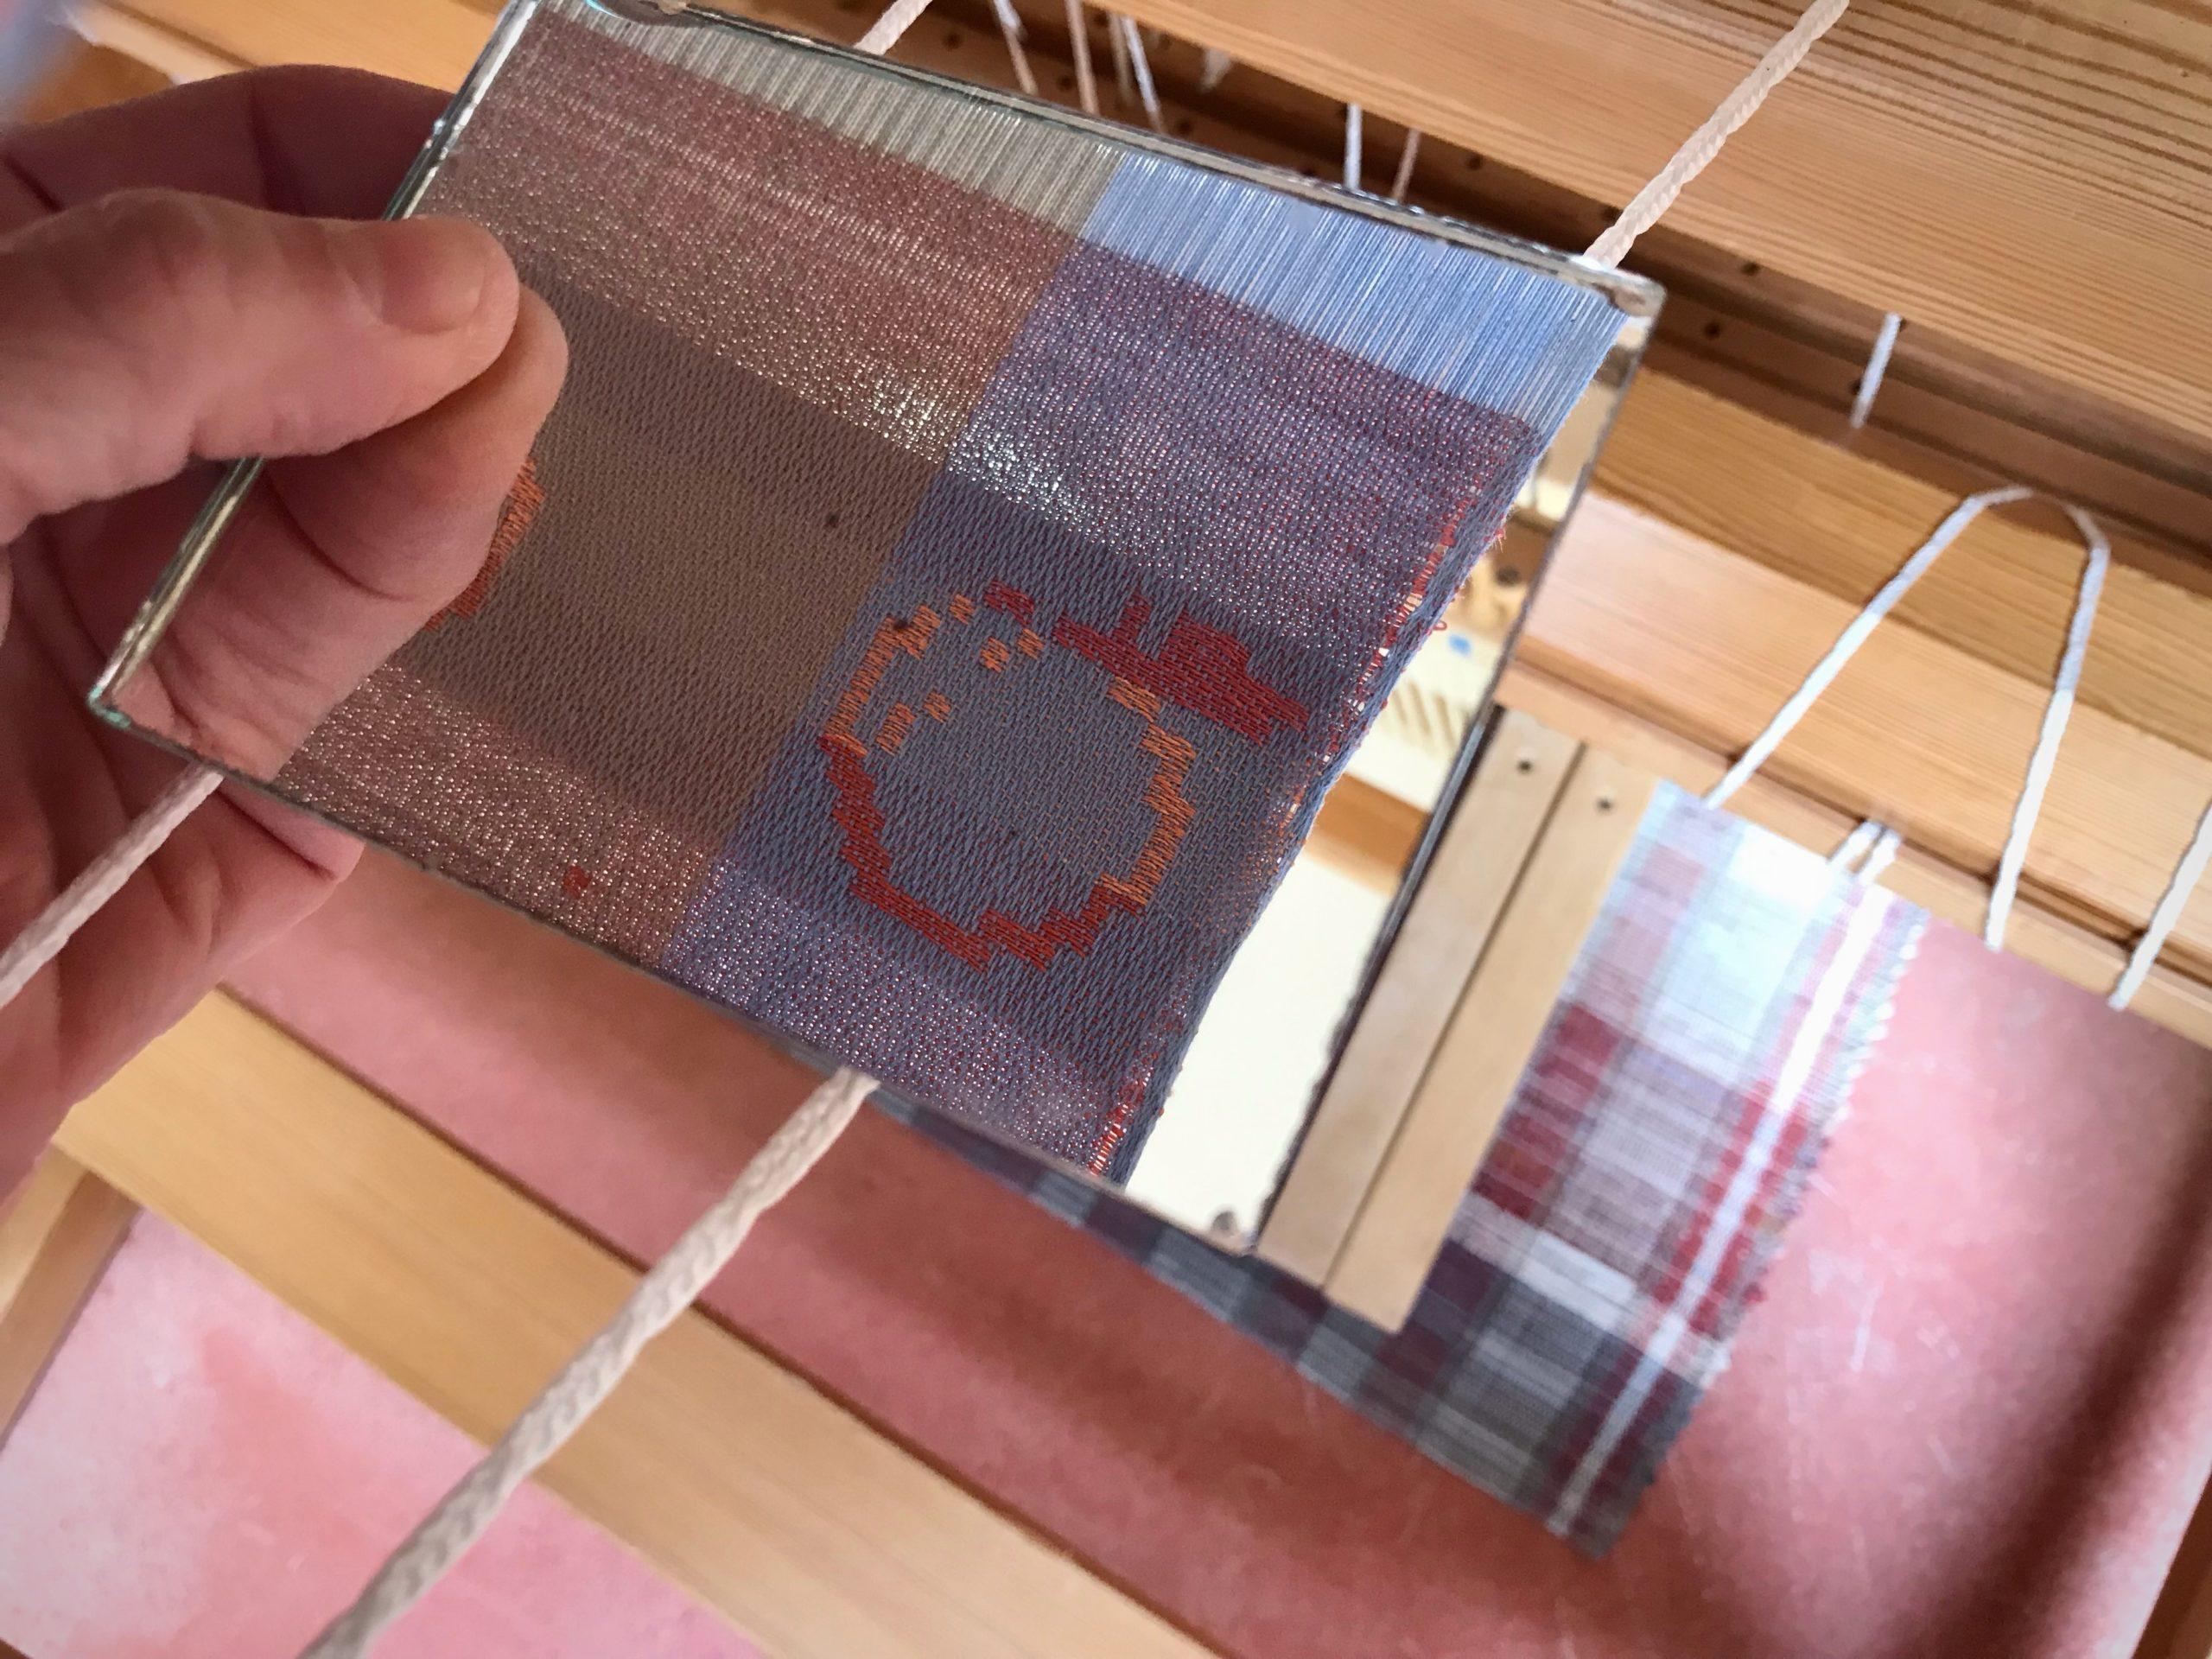 Mirror shows reversed side of drawloom fabric.